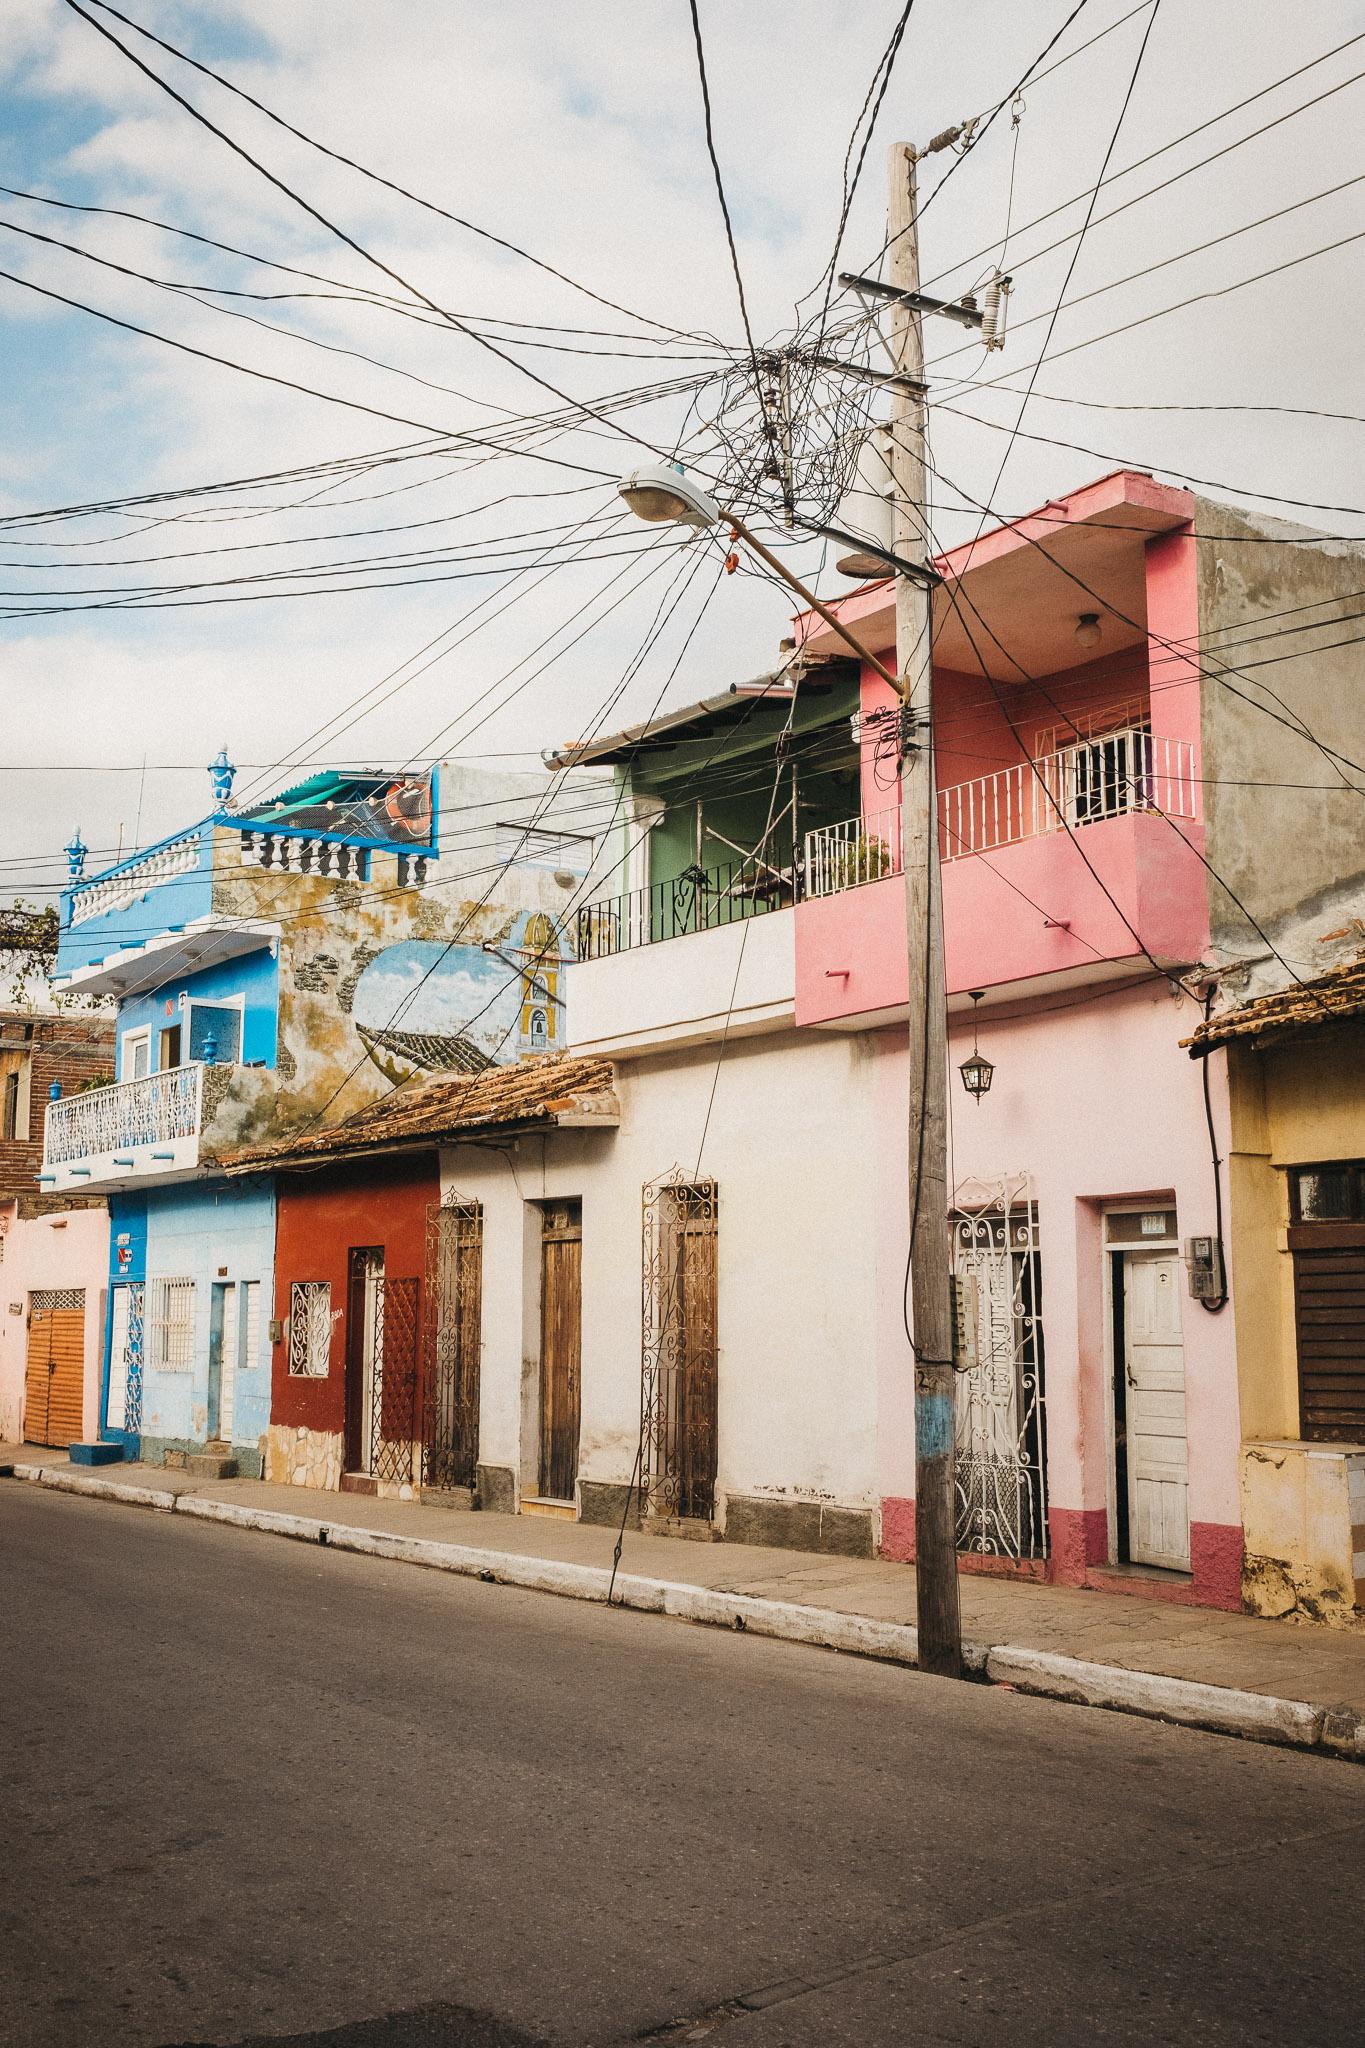 Cuba-2017-12-Trinidad-0178.jpg